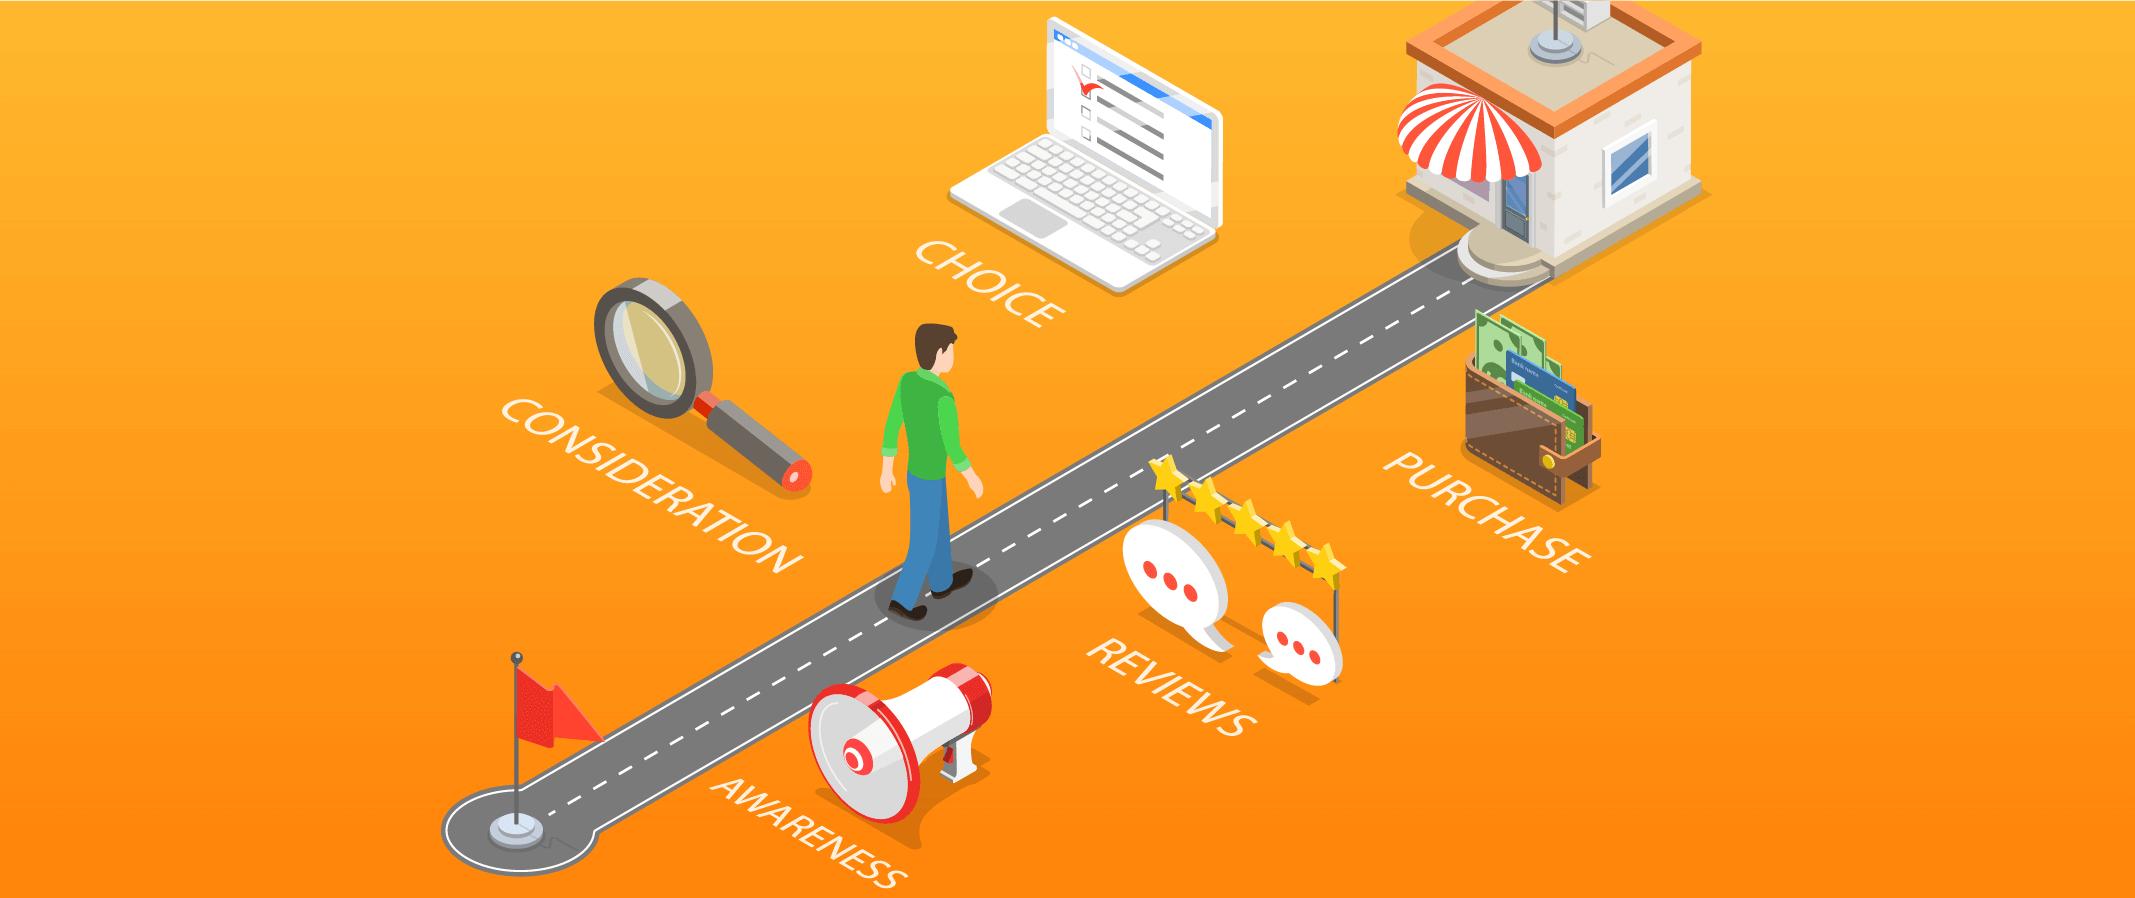 Laser-Focused User Acquisition Strategies to Skyrocket Ecommerce App Downloads